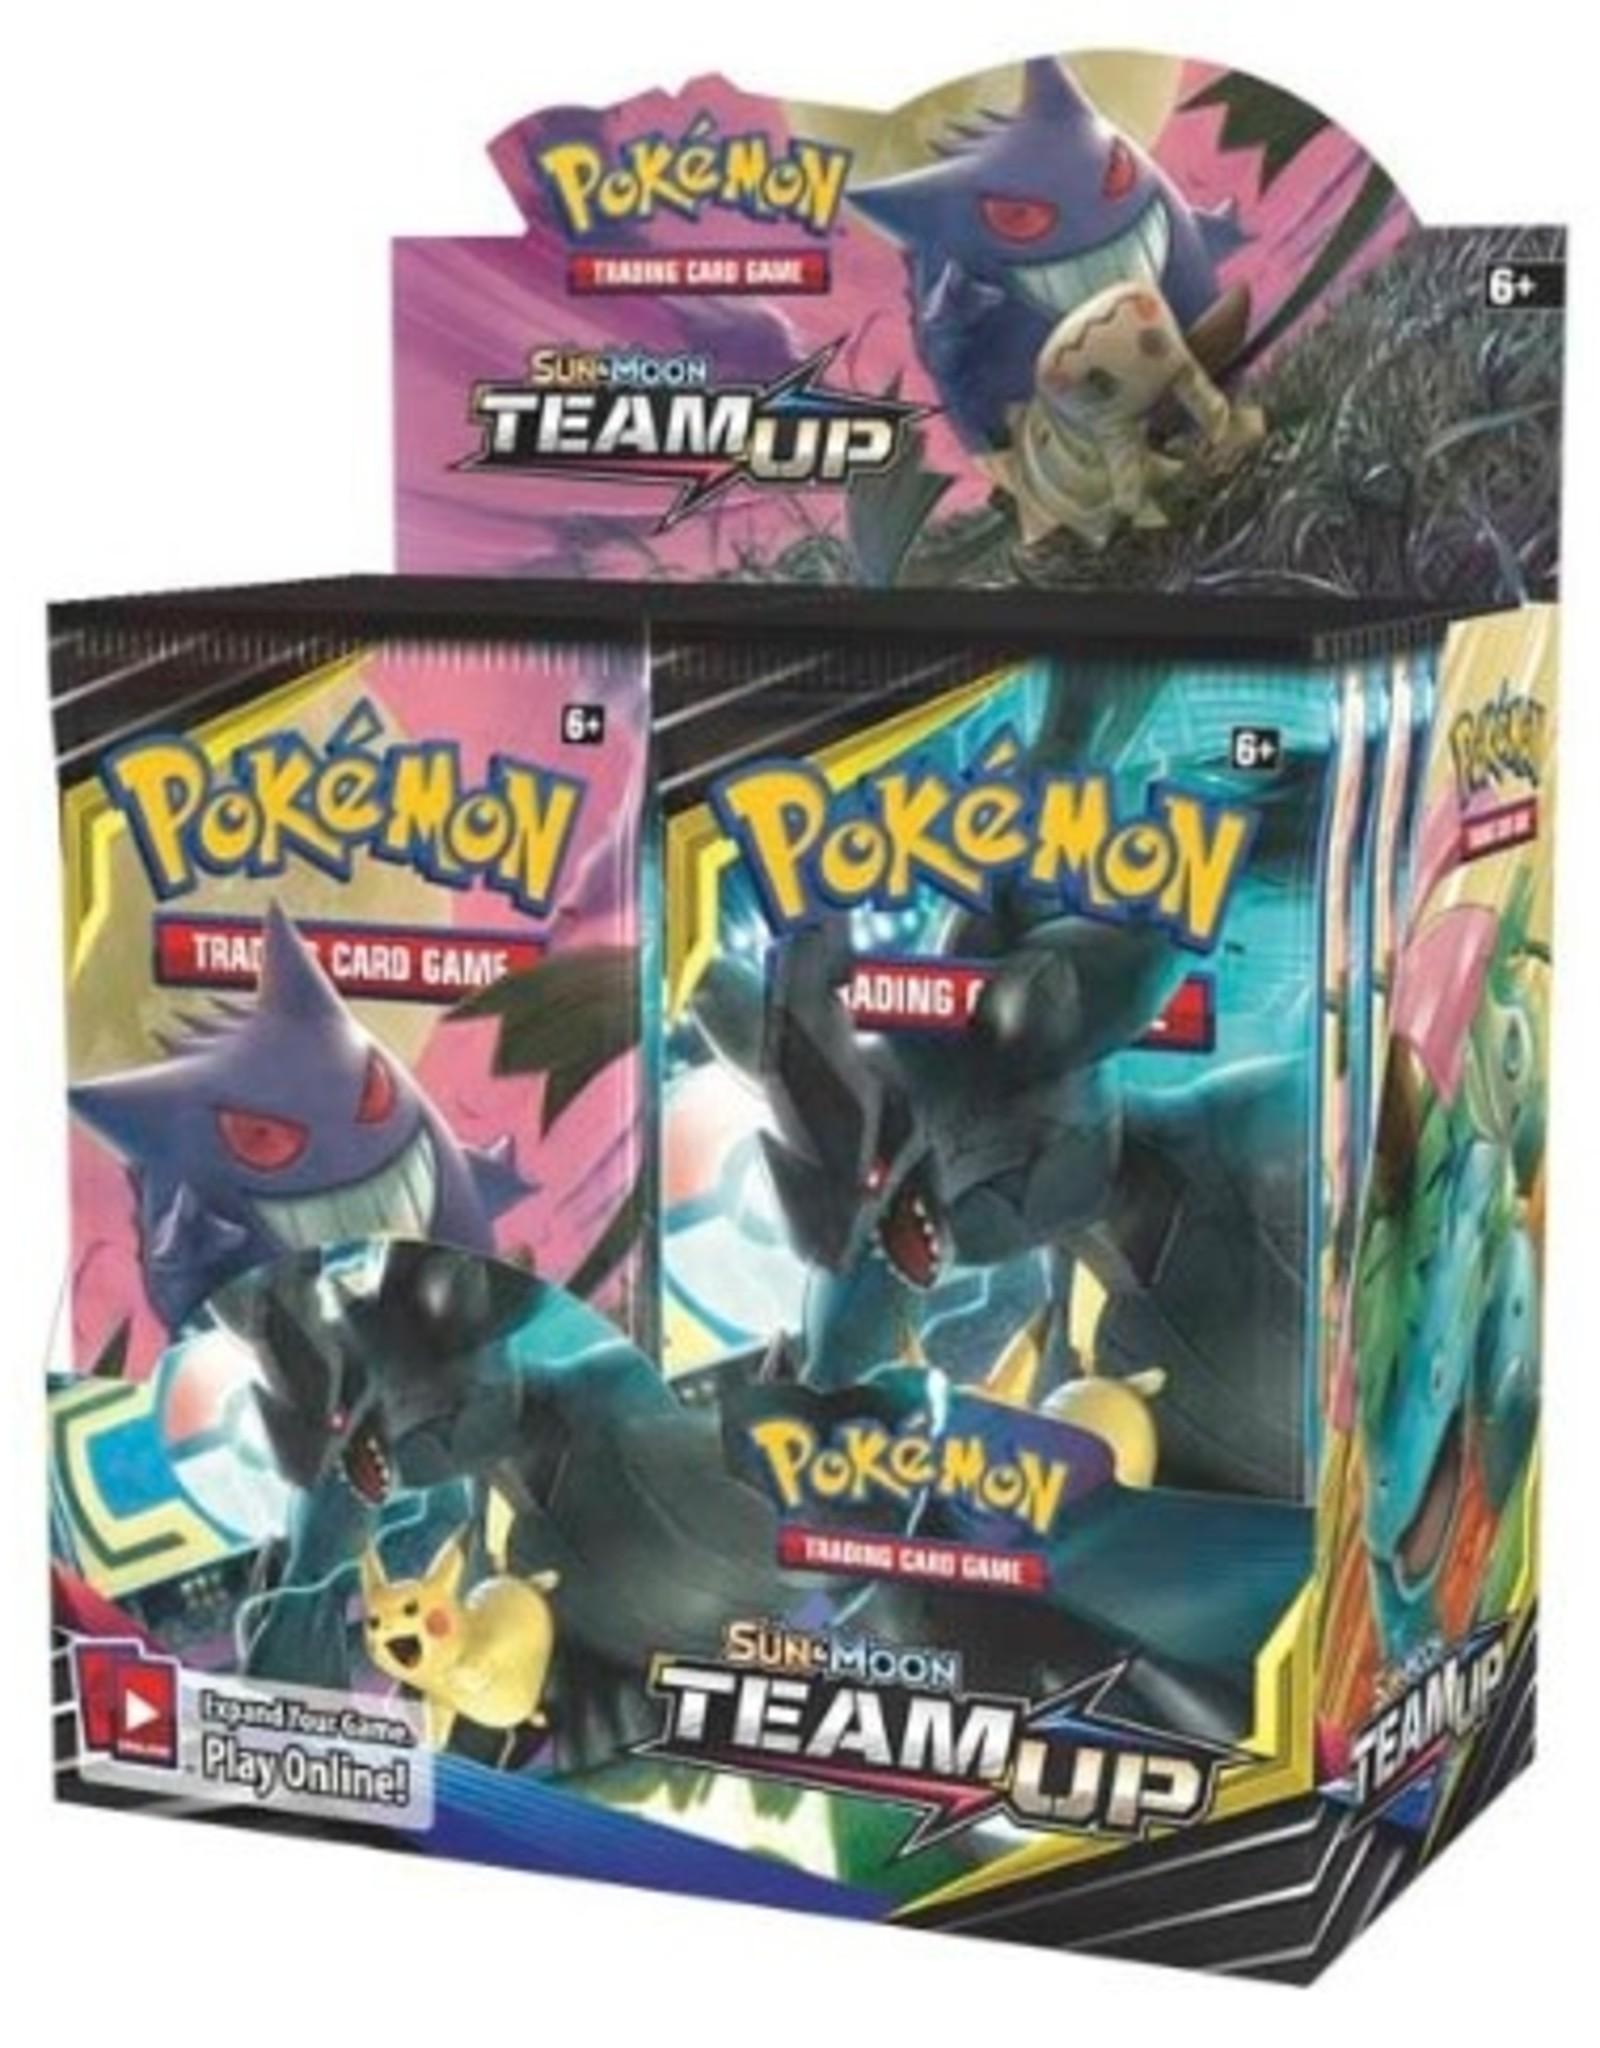 Pokemon Pokemon Team Up Booster Box